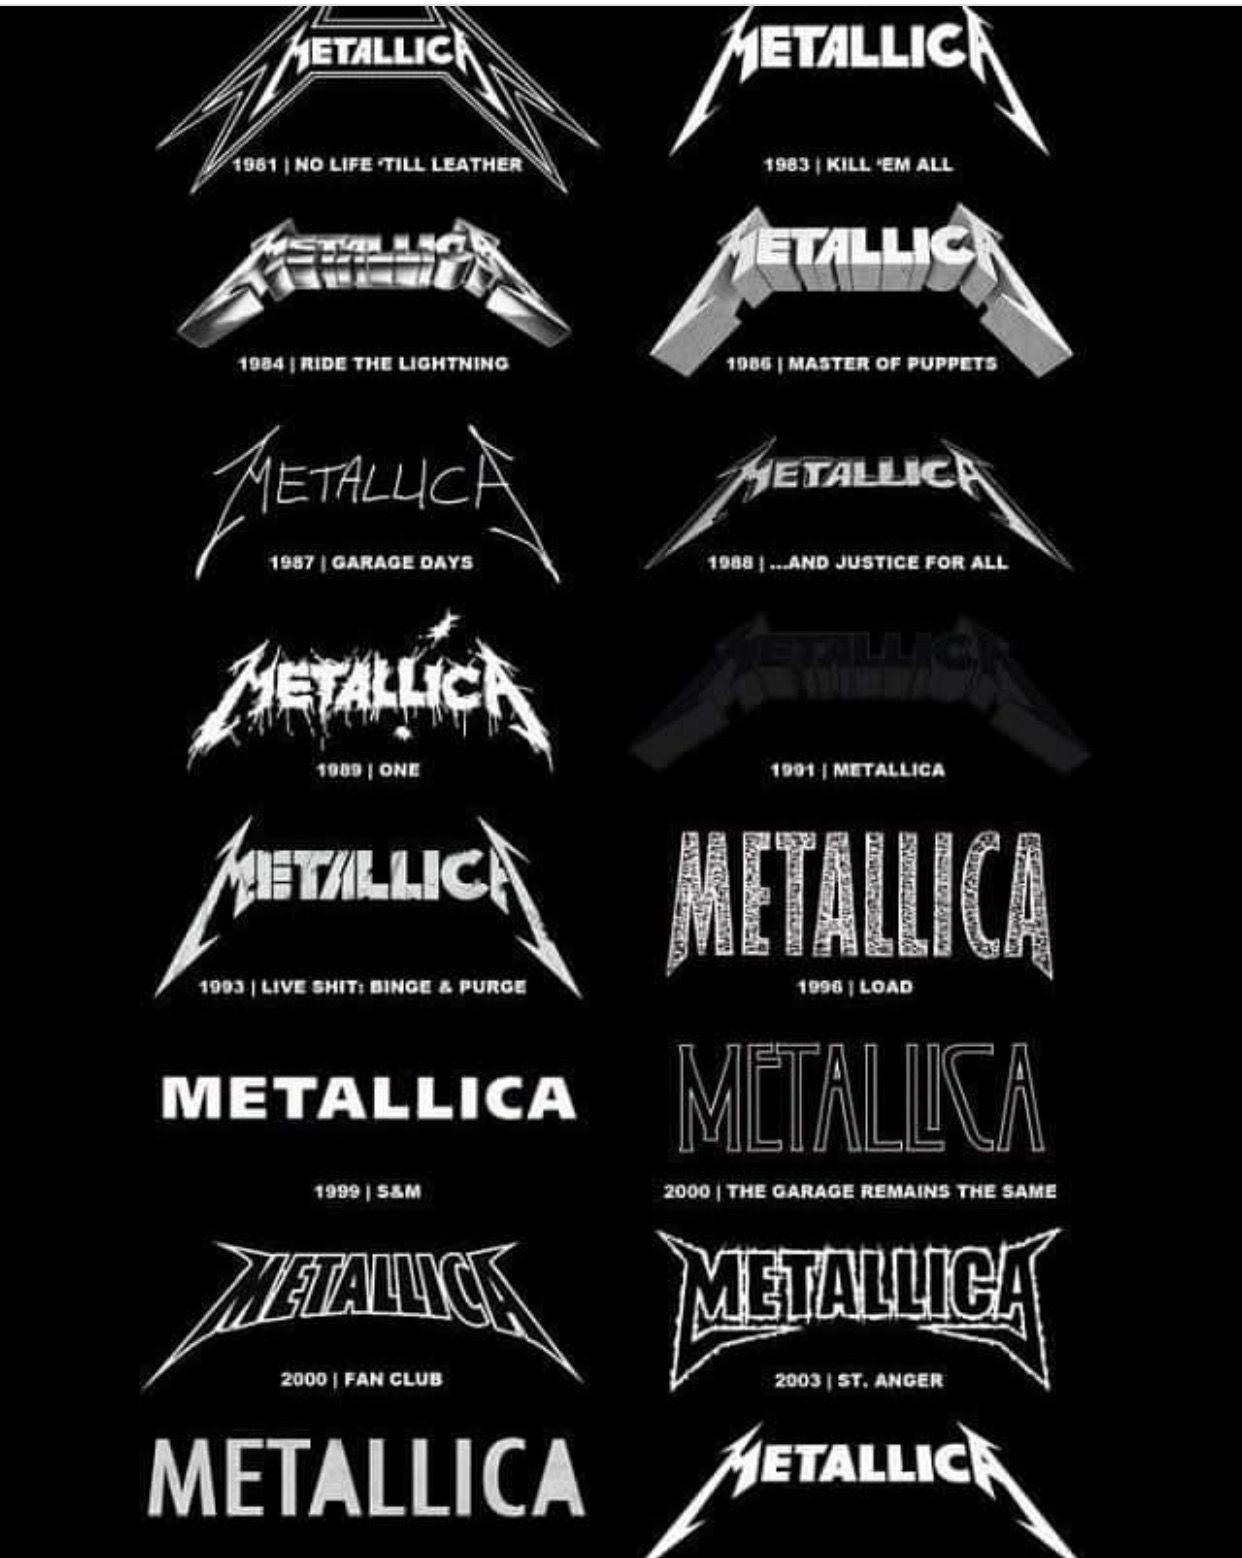 Metallica history